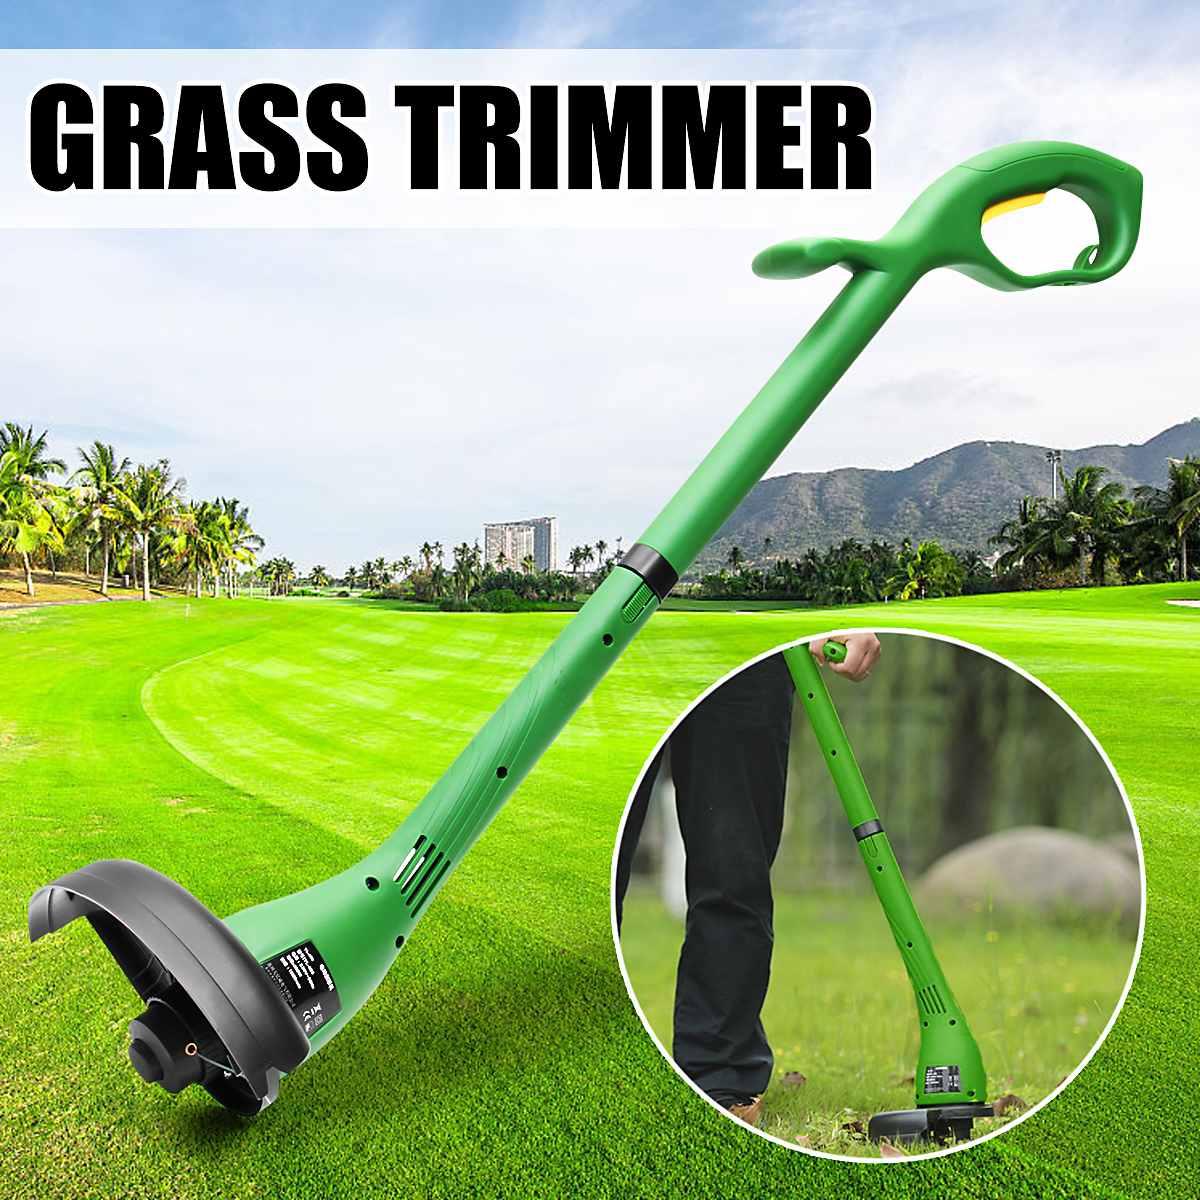 12500RPM 220V 500W Home Electric Lawn Mower Portable Grass Trimmer Garden Lawn Mower Weeding Machine Power Tool